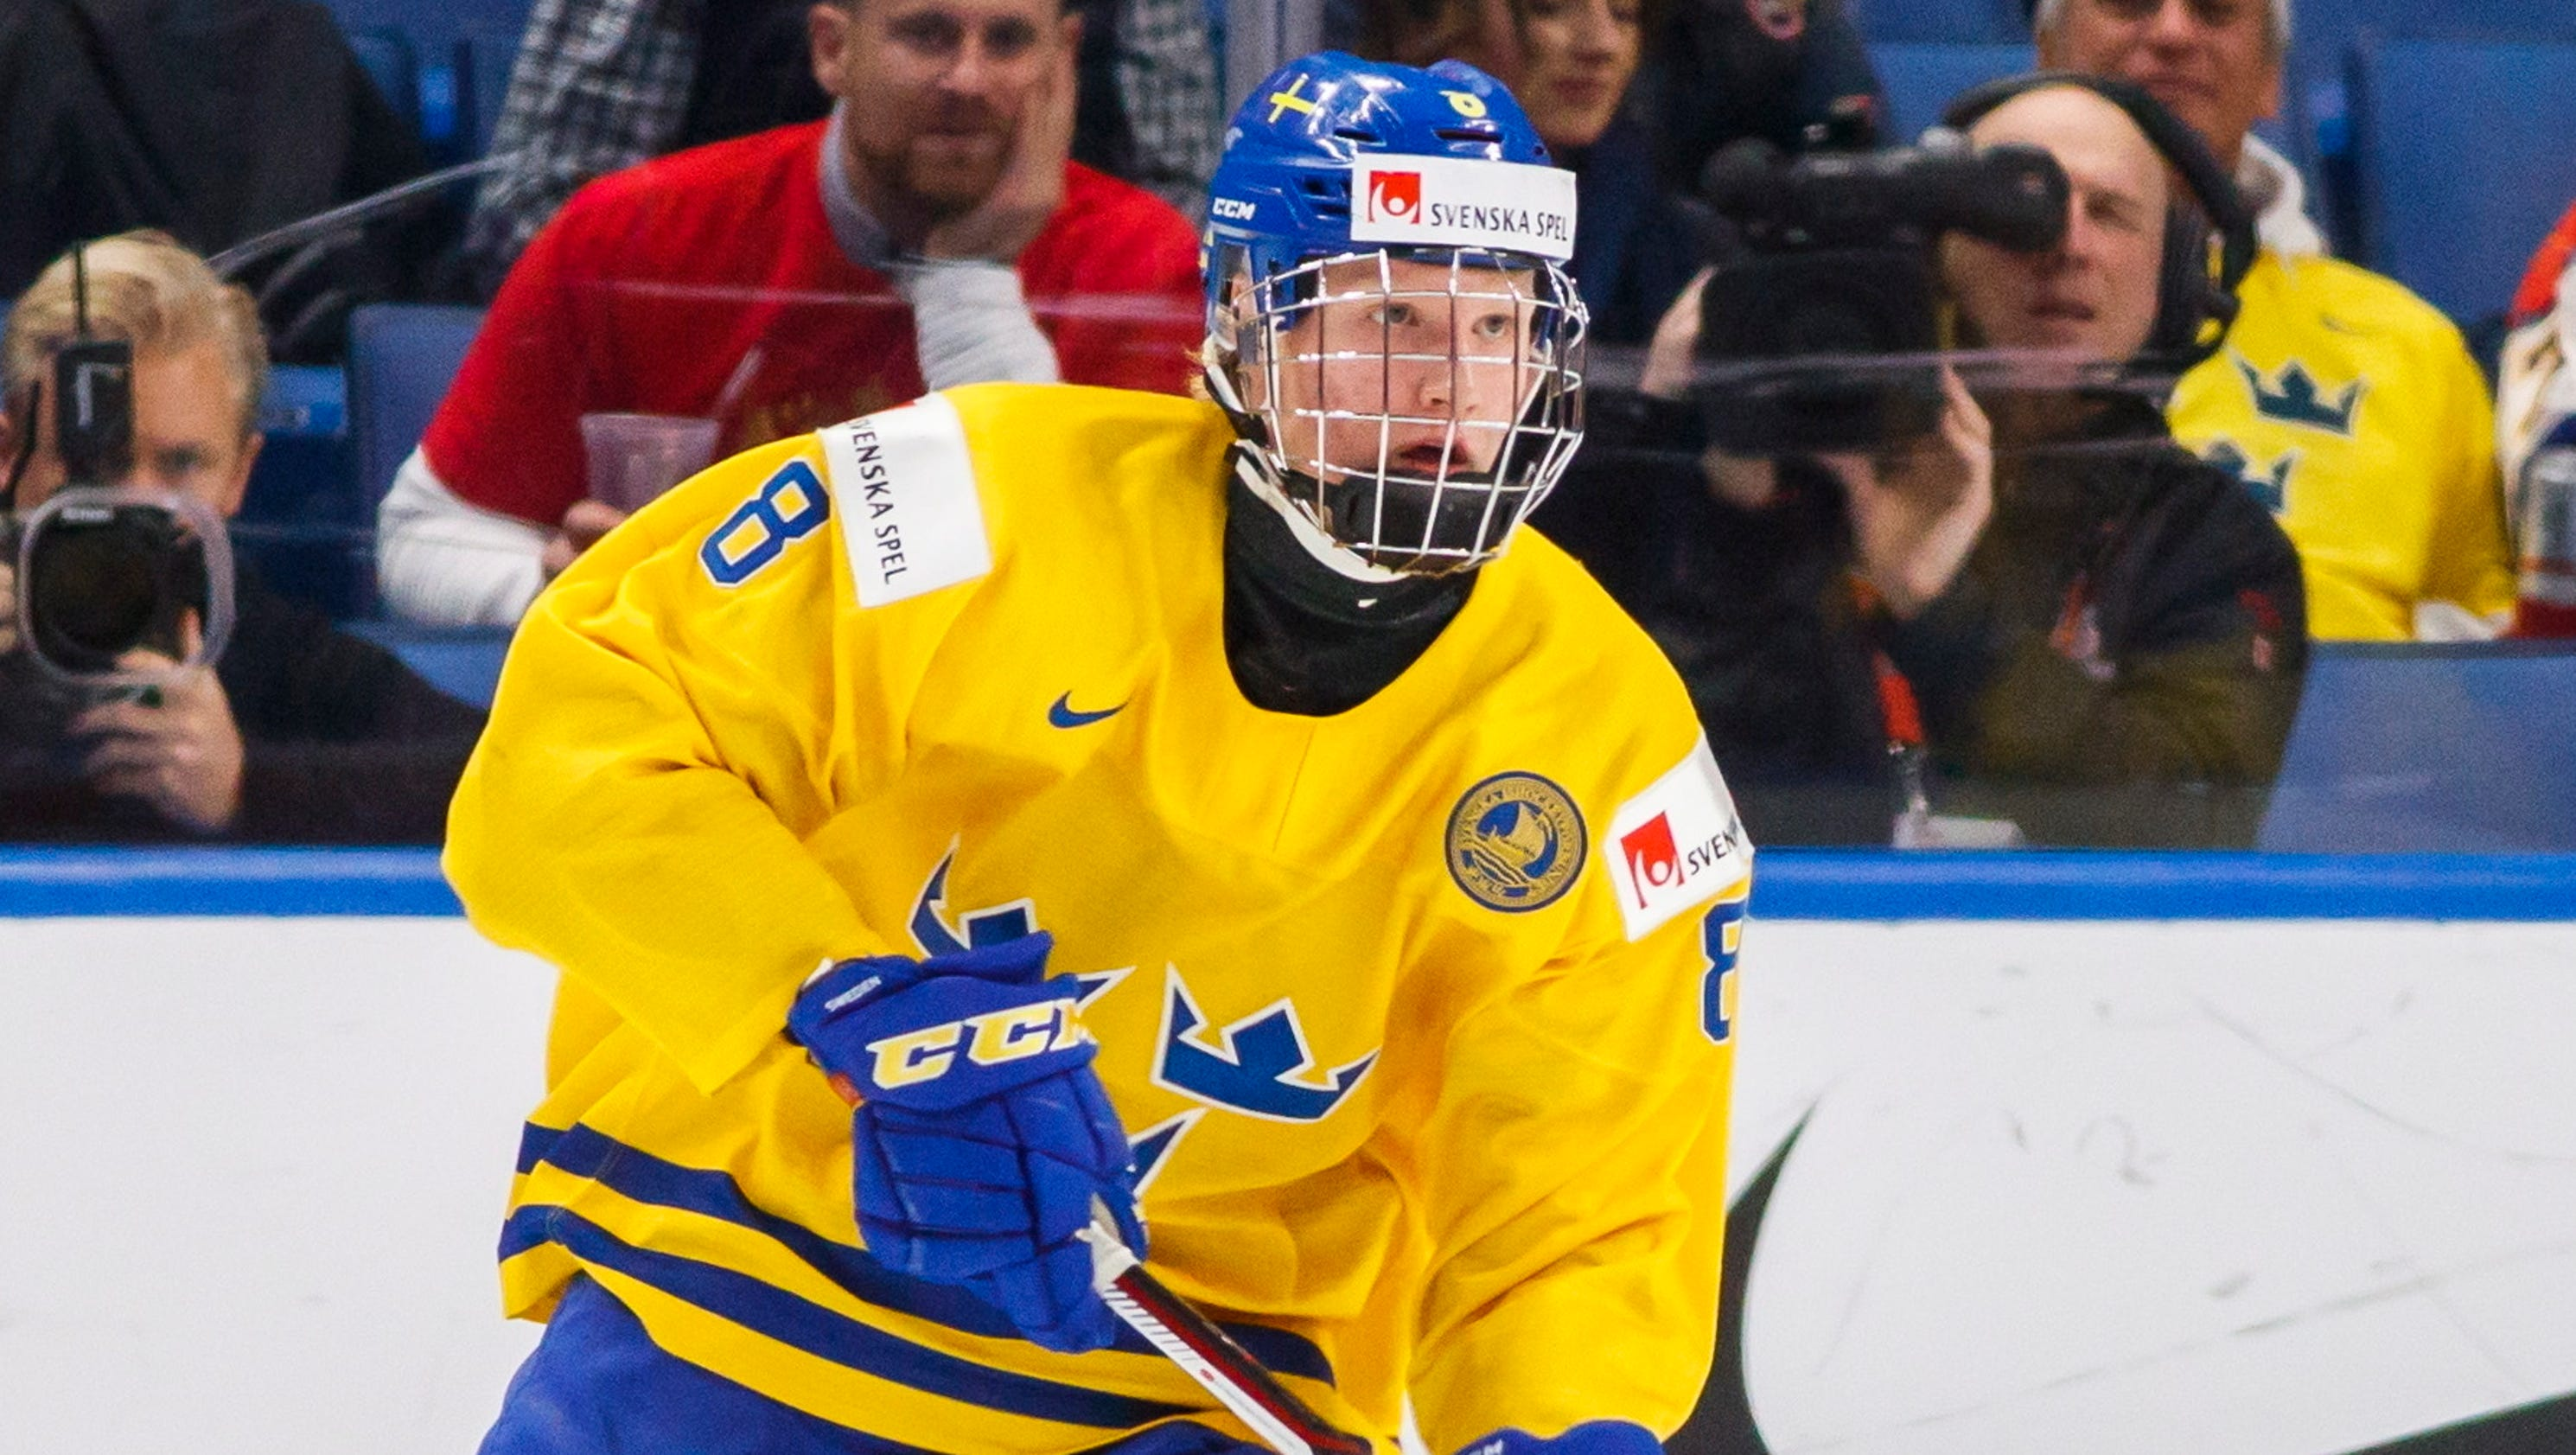 636576499968922818-ap-pyeongchang-olympics-hockey-sweden-dahlin